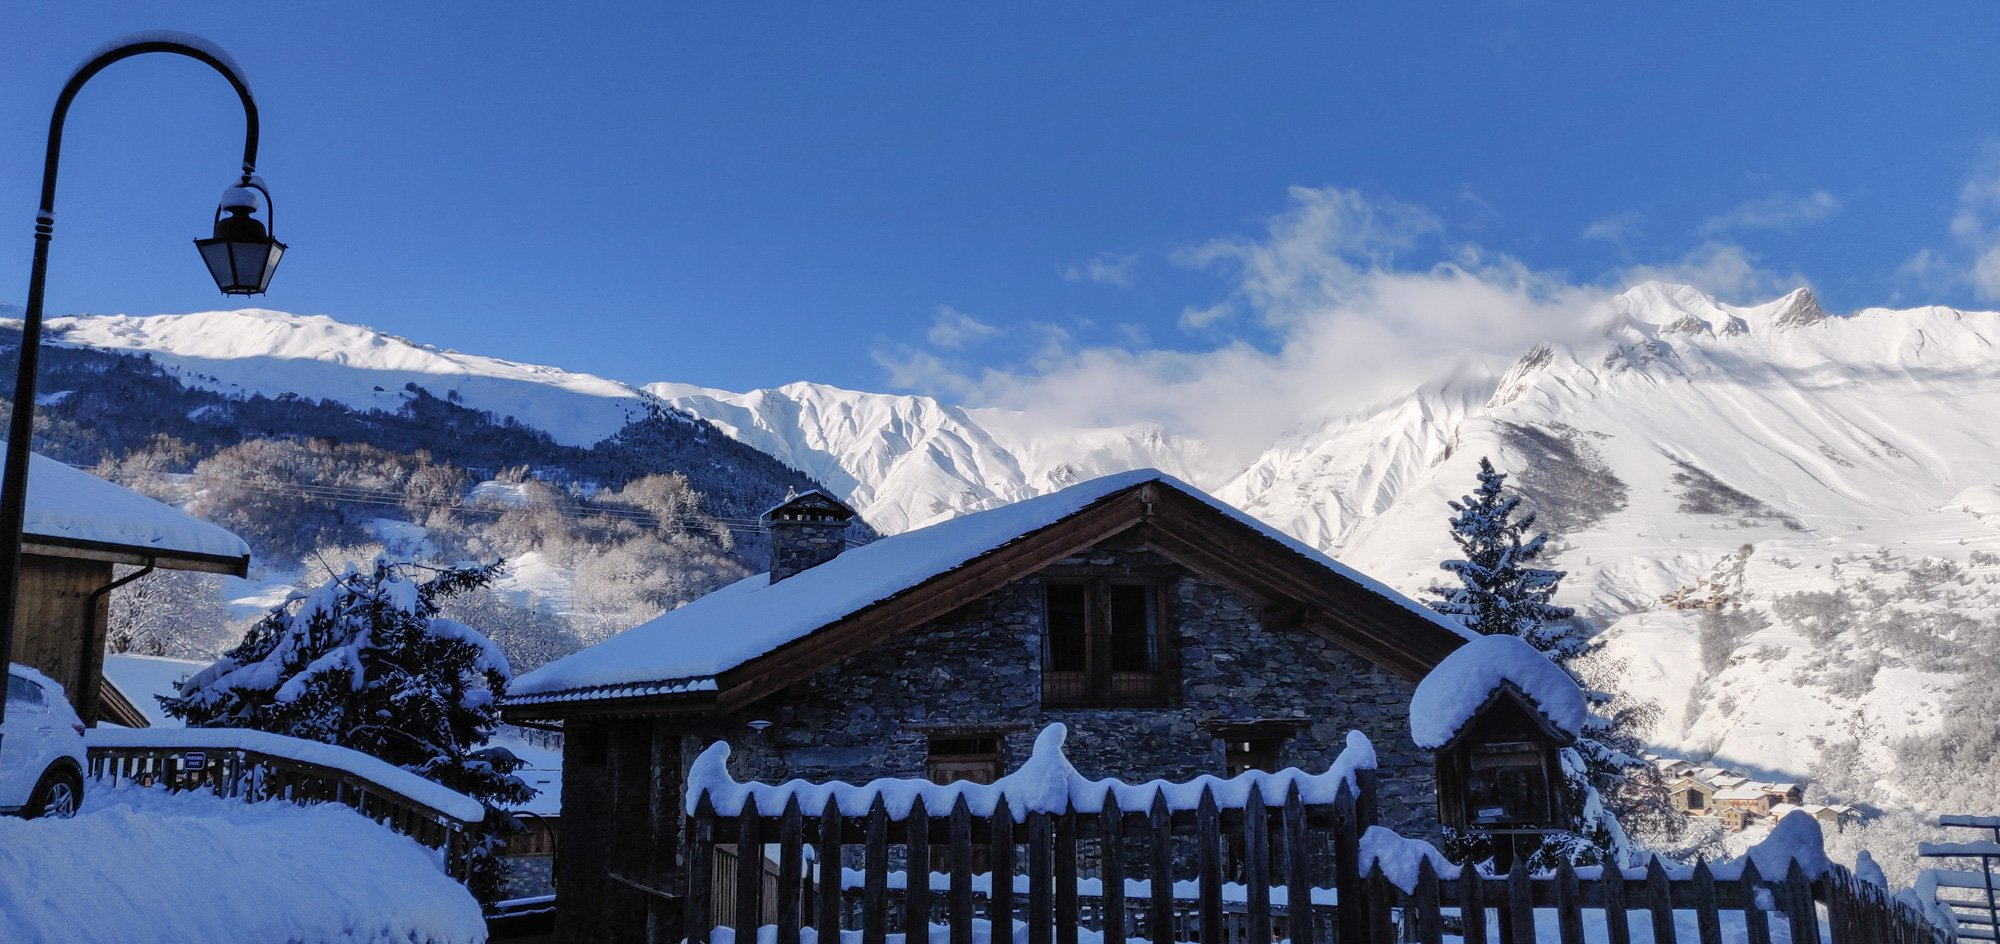 Winter wonderland - Les Granges, St Martin de Belleville